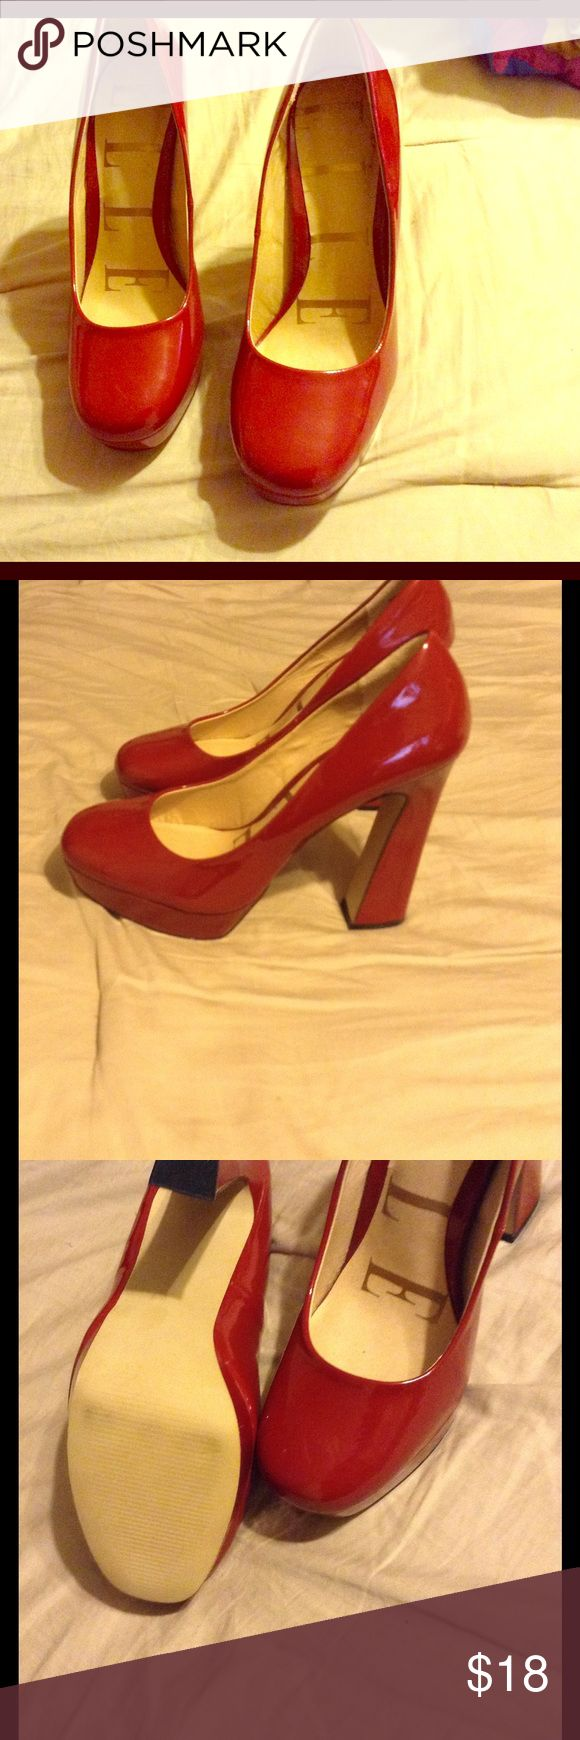 Red Heels NWOT Patent leather red heels ELLE Shoes Heels